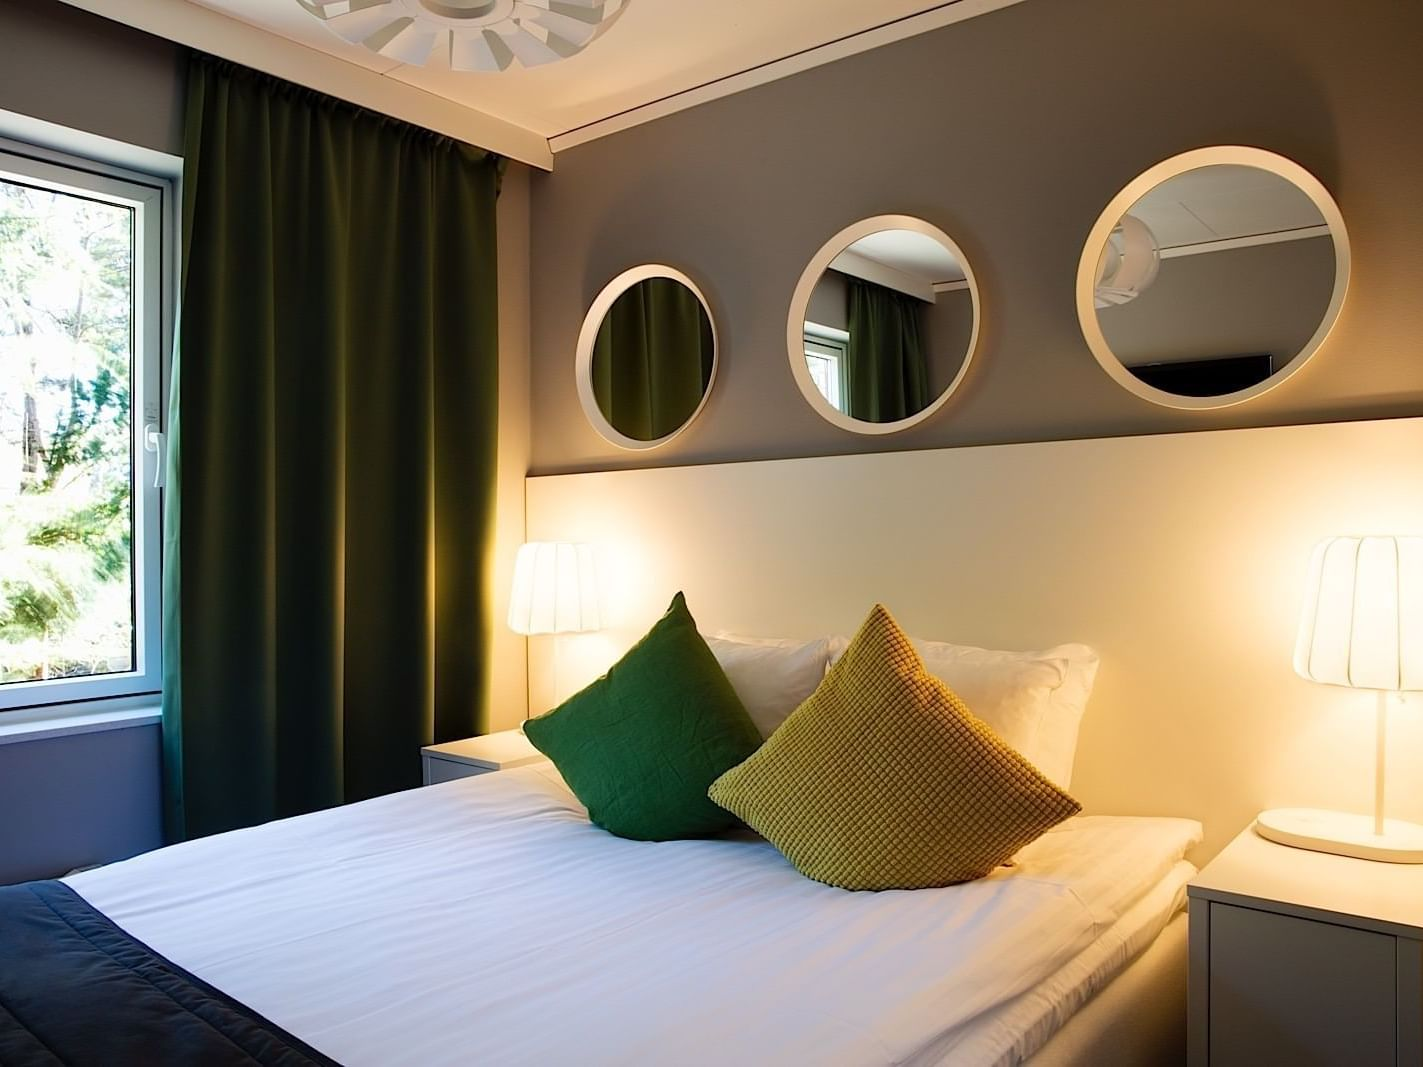 Compact Room at Welcome Hotel in Järfälla, Sweden